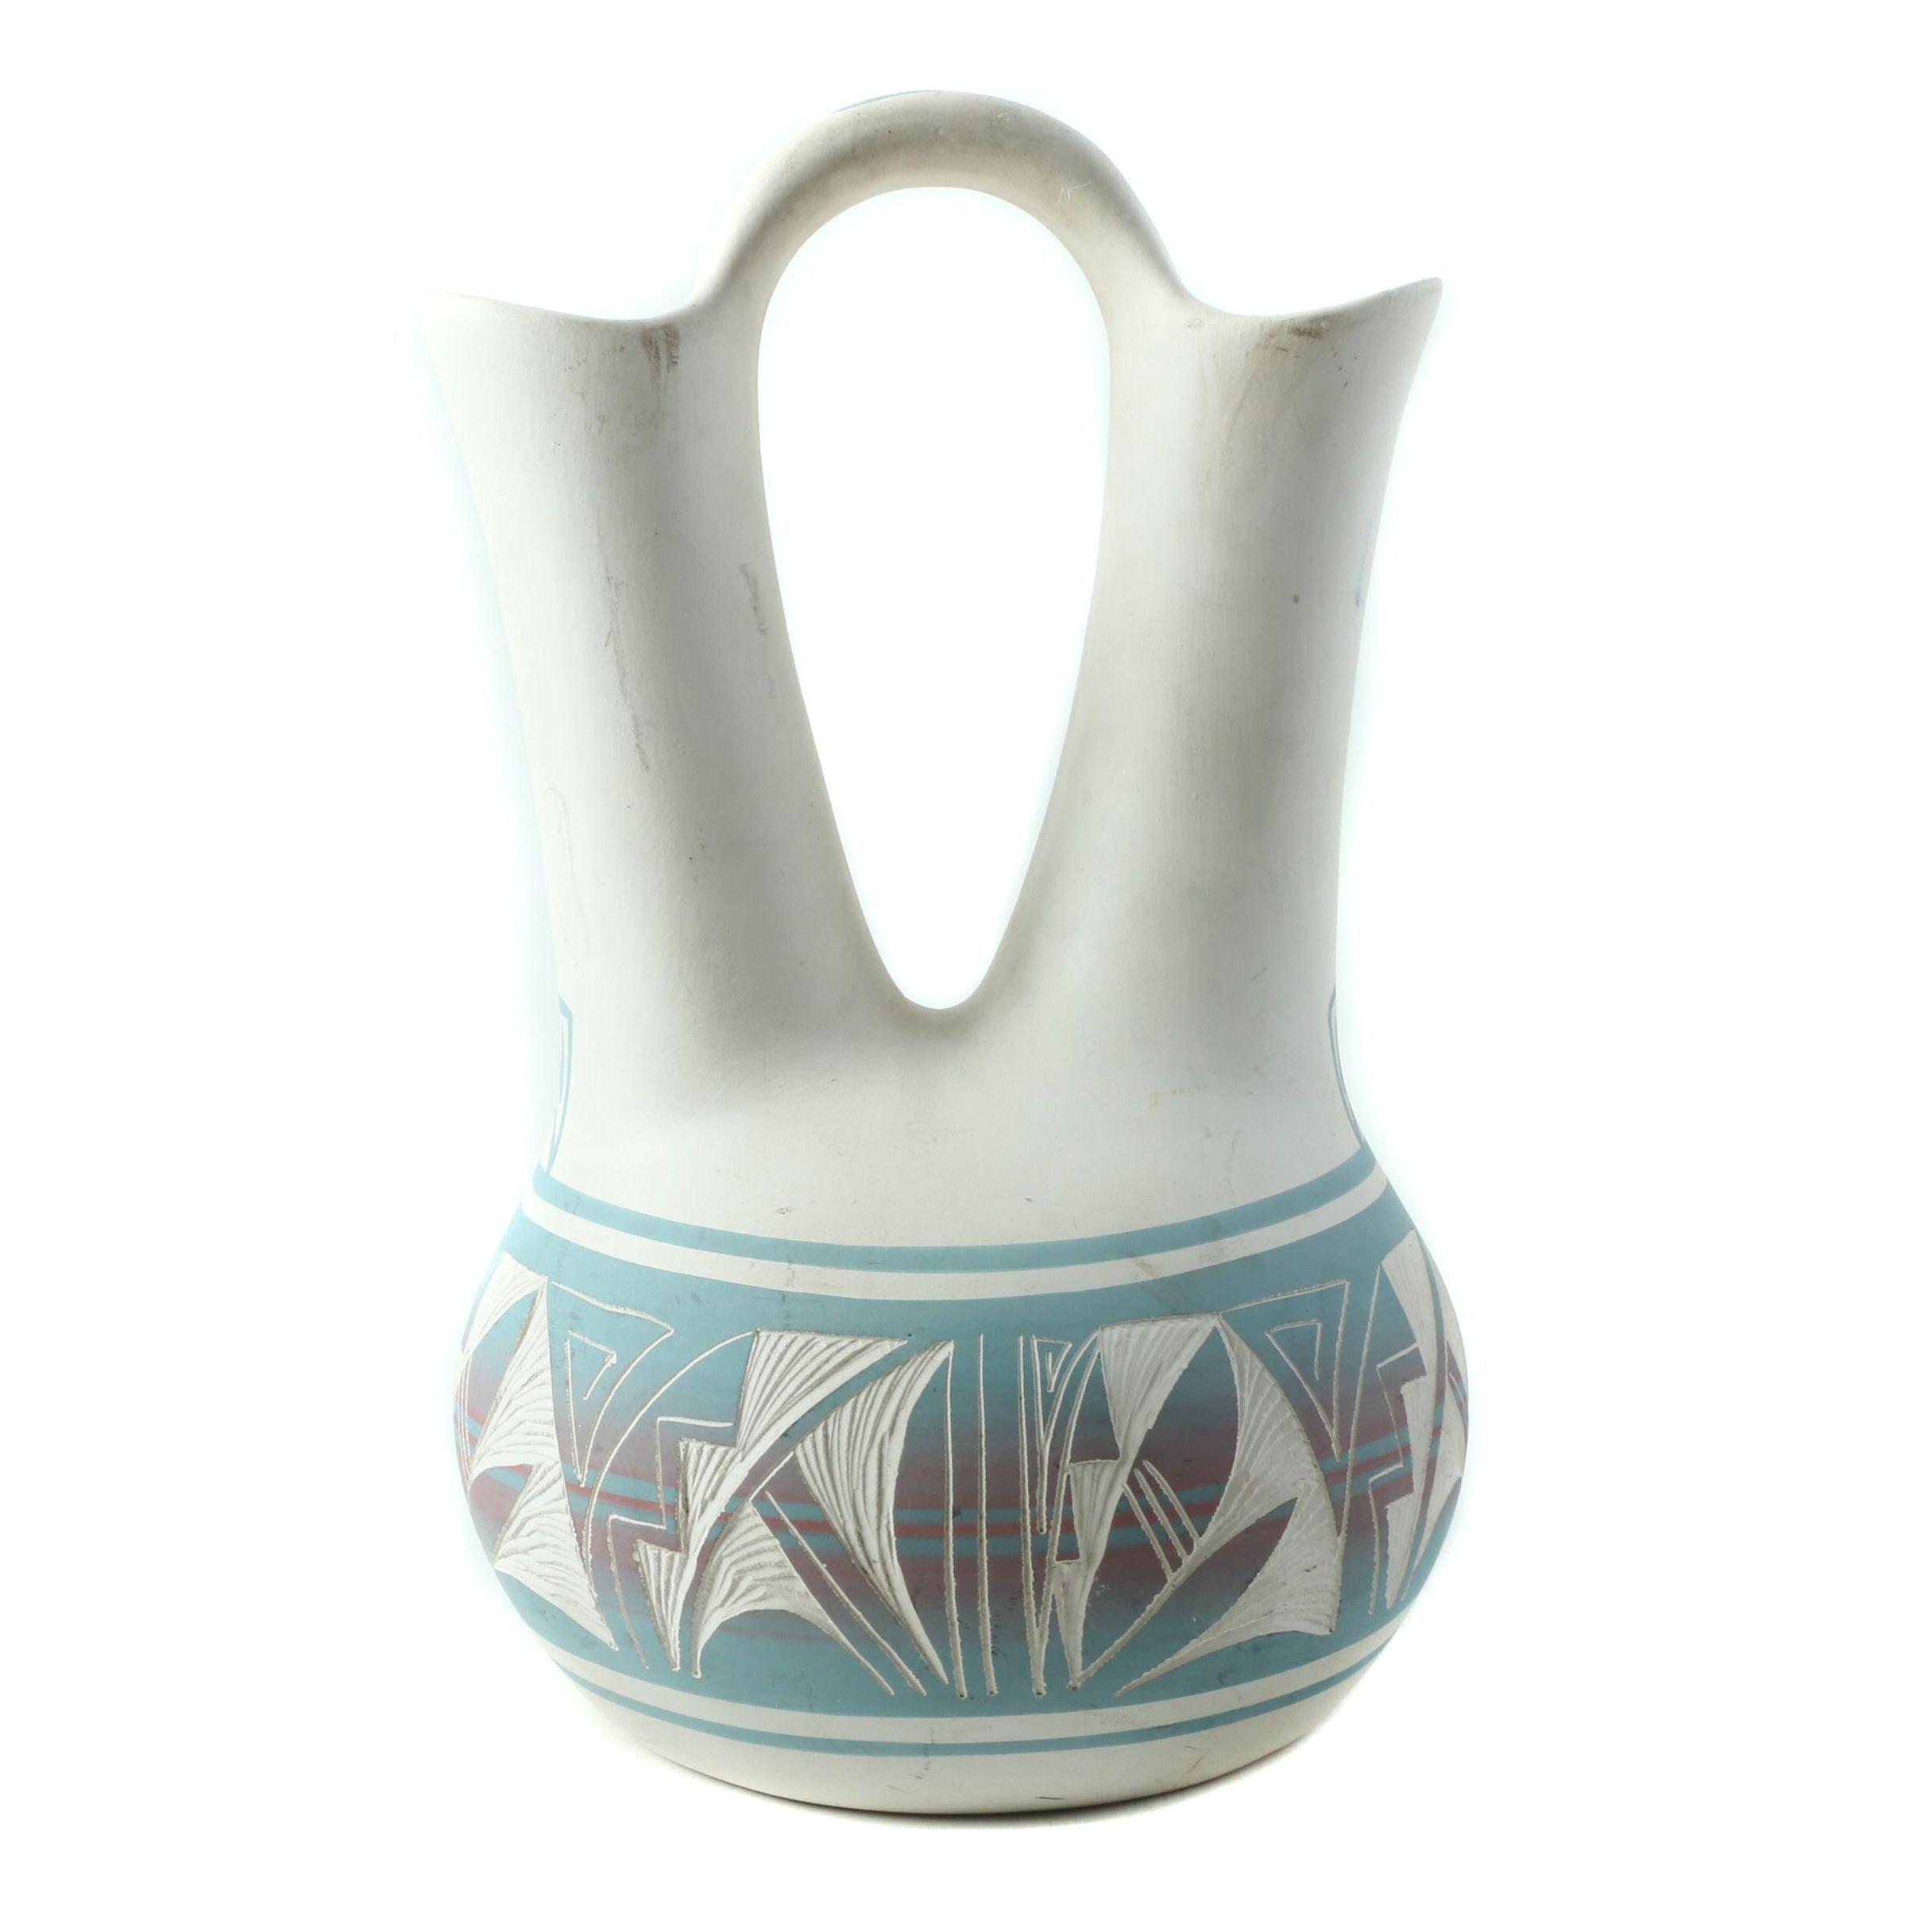 Signed Begay Navajo Wedding Vase